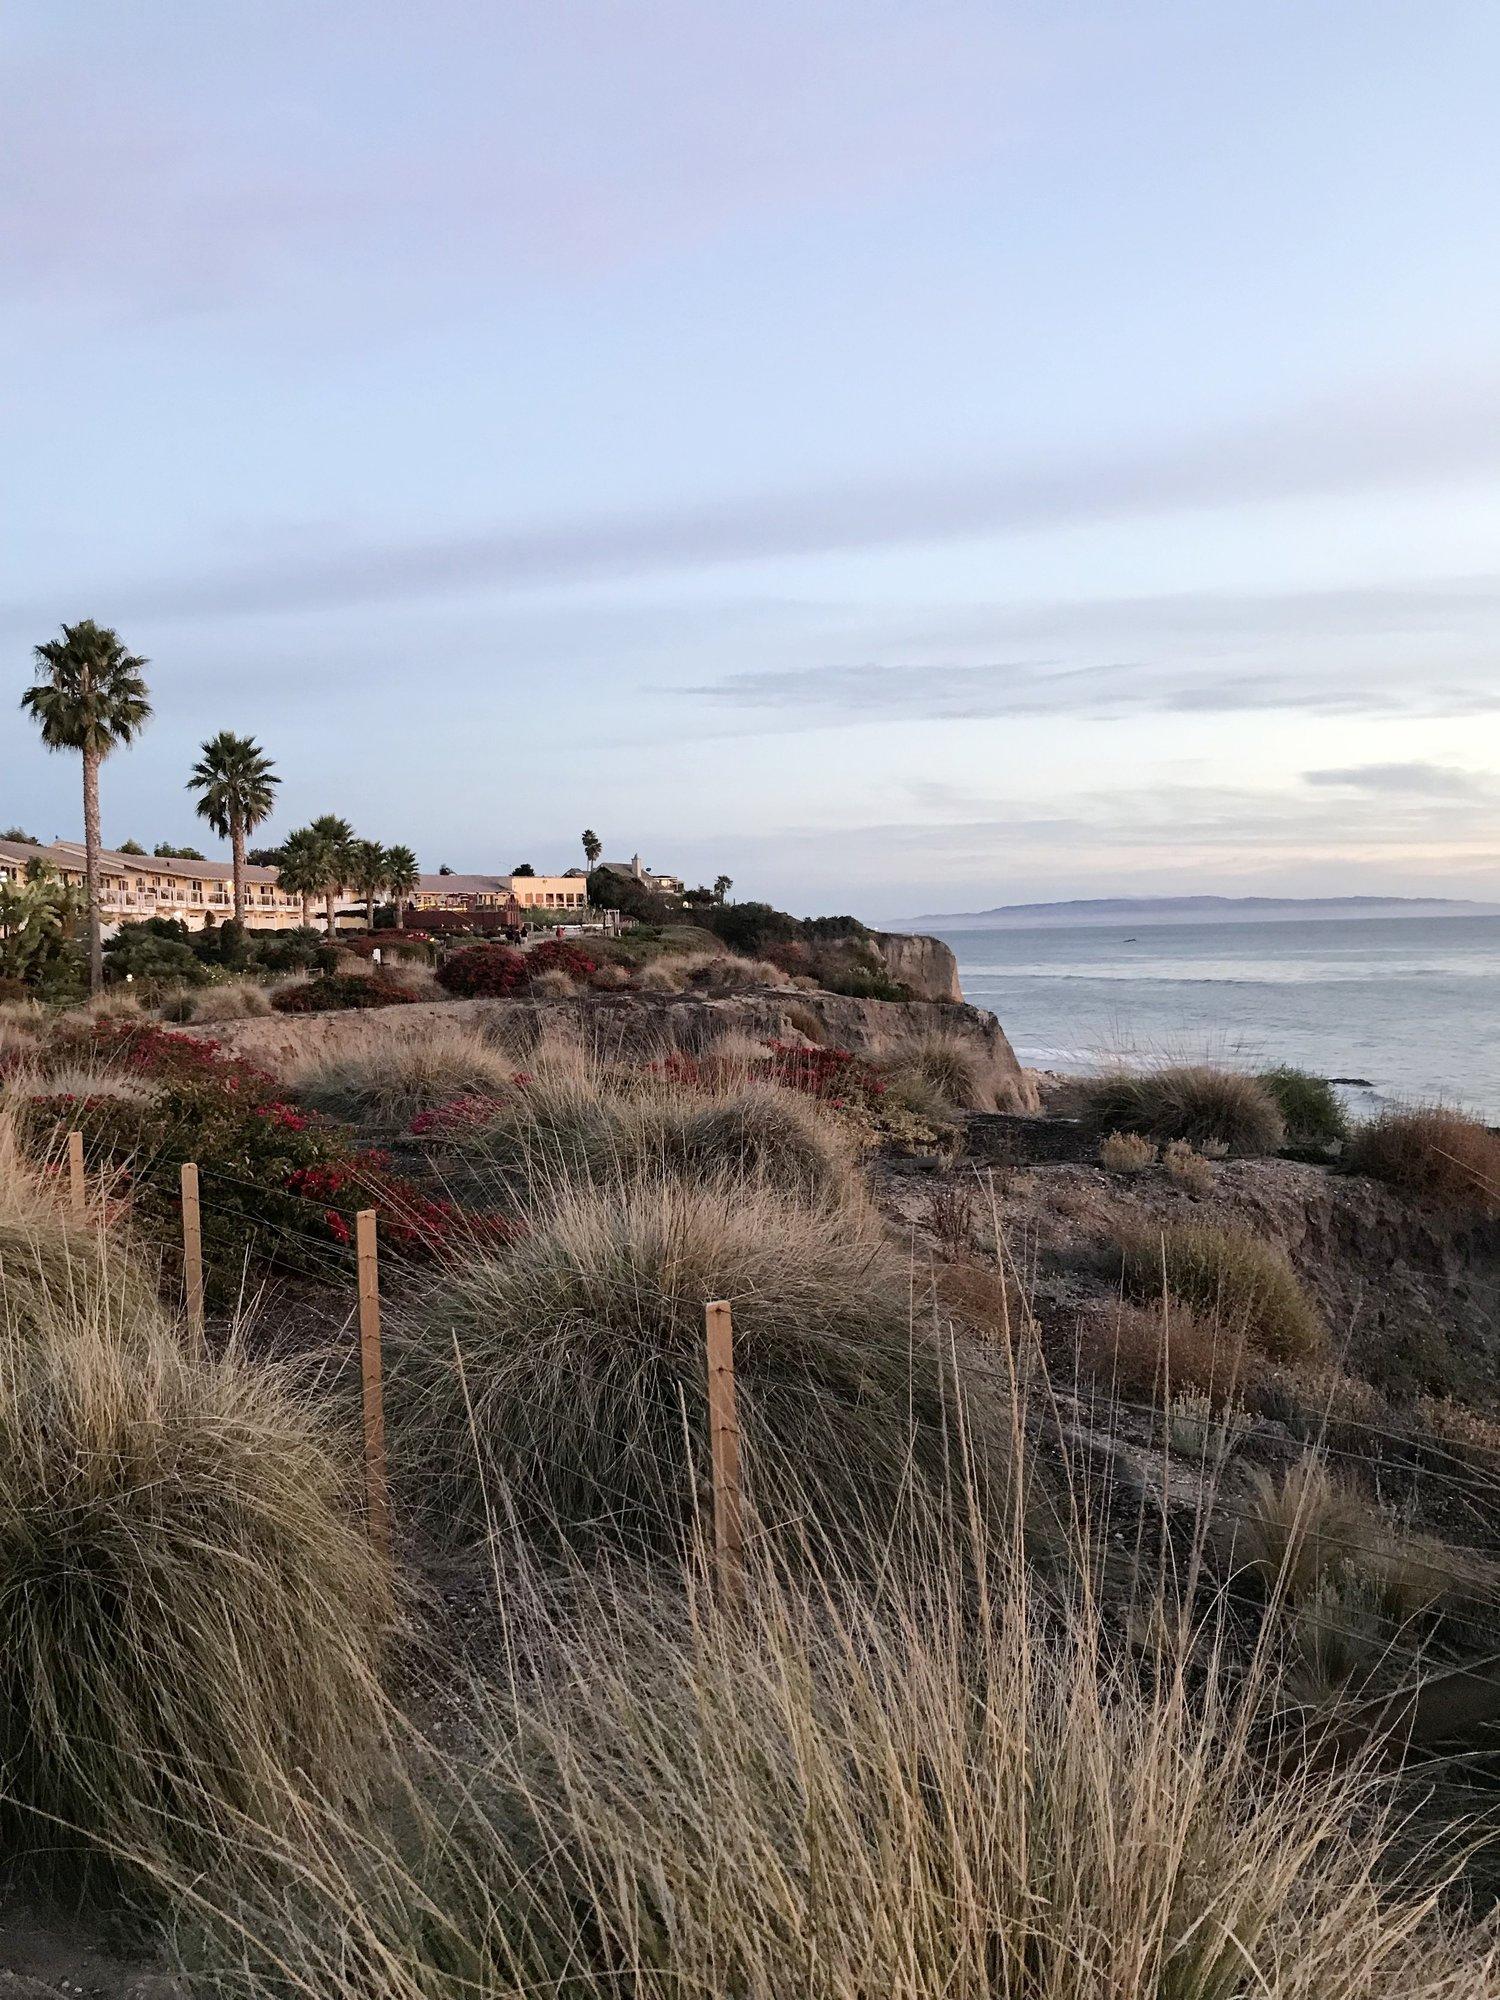 Surprise Dog-Friendly Birthday Trip to Pismo Beach — Have